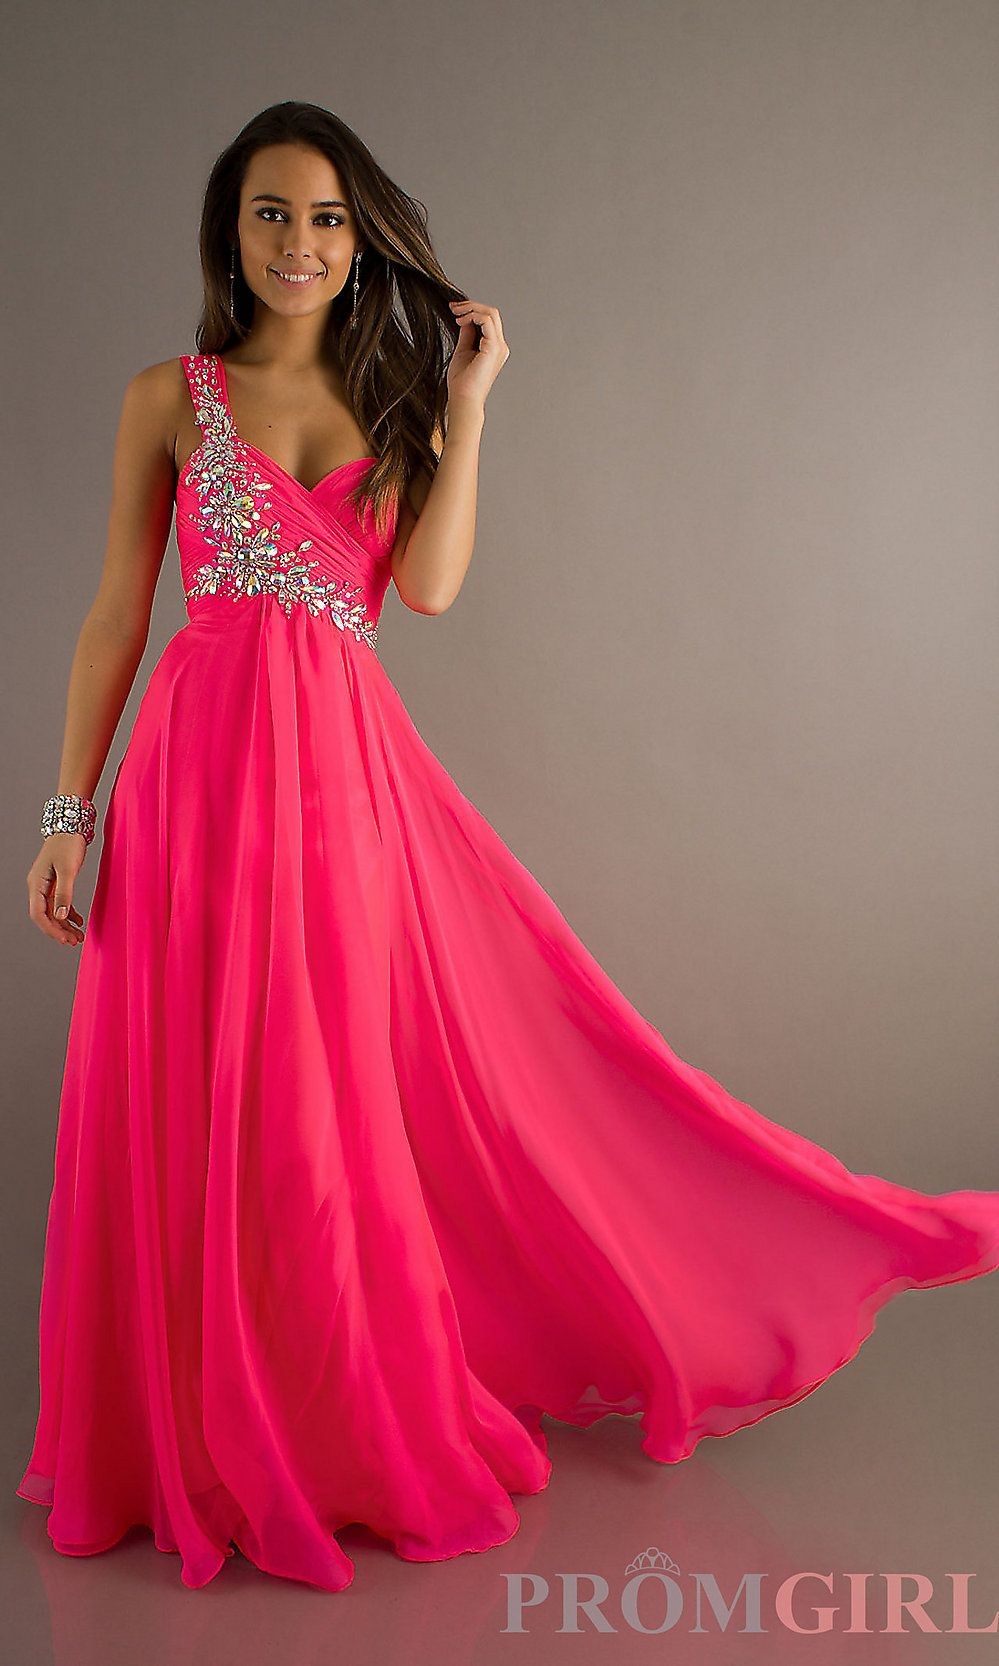 Pink floor length one shoulder bridesmaid dress shelby stuff